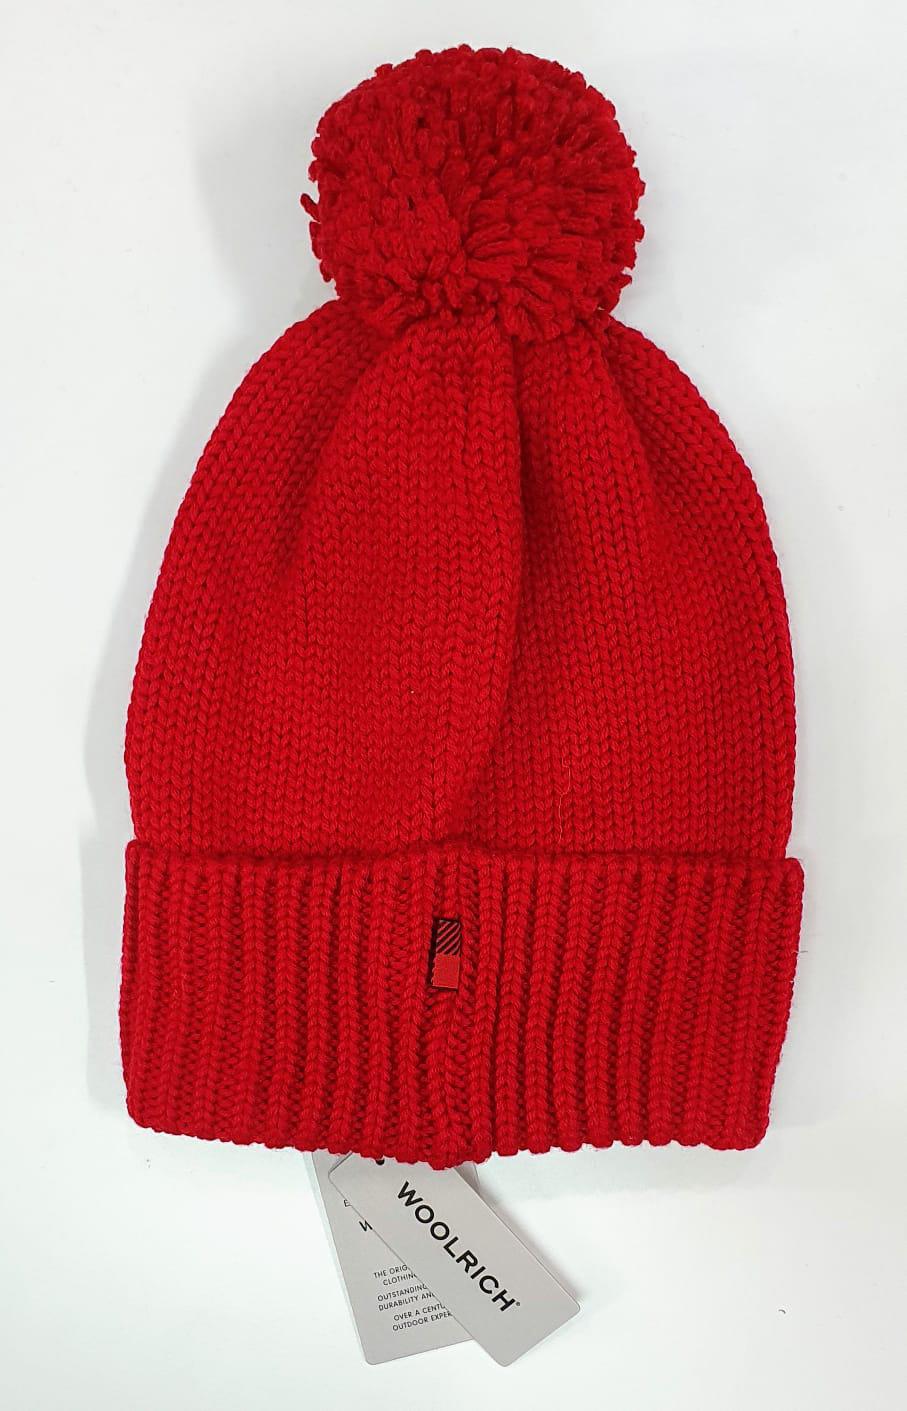 WOOLRICH Berretto in lana con pon pon rosso